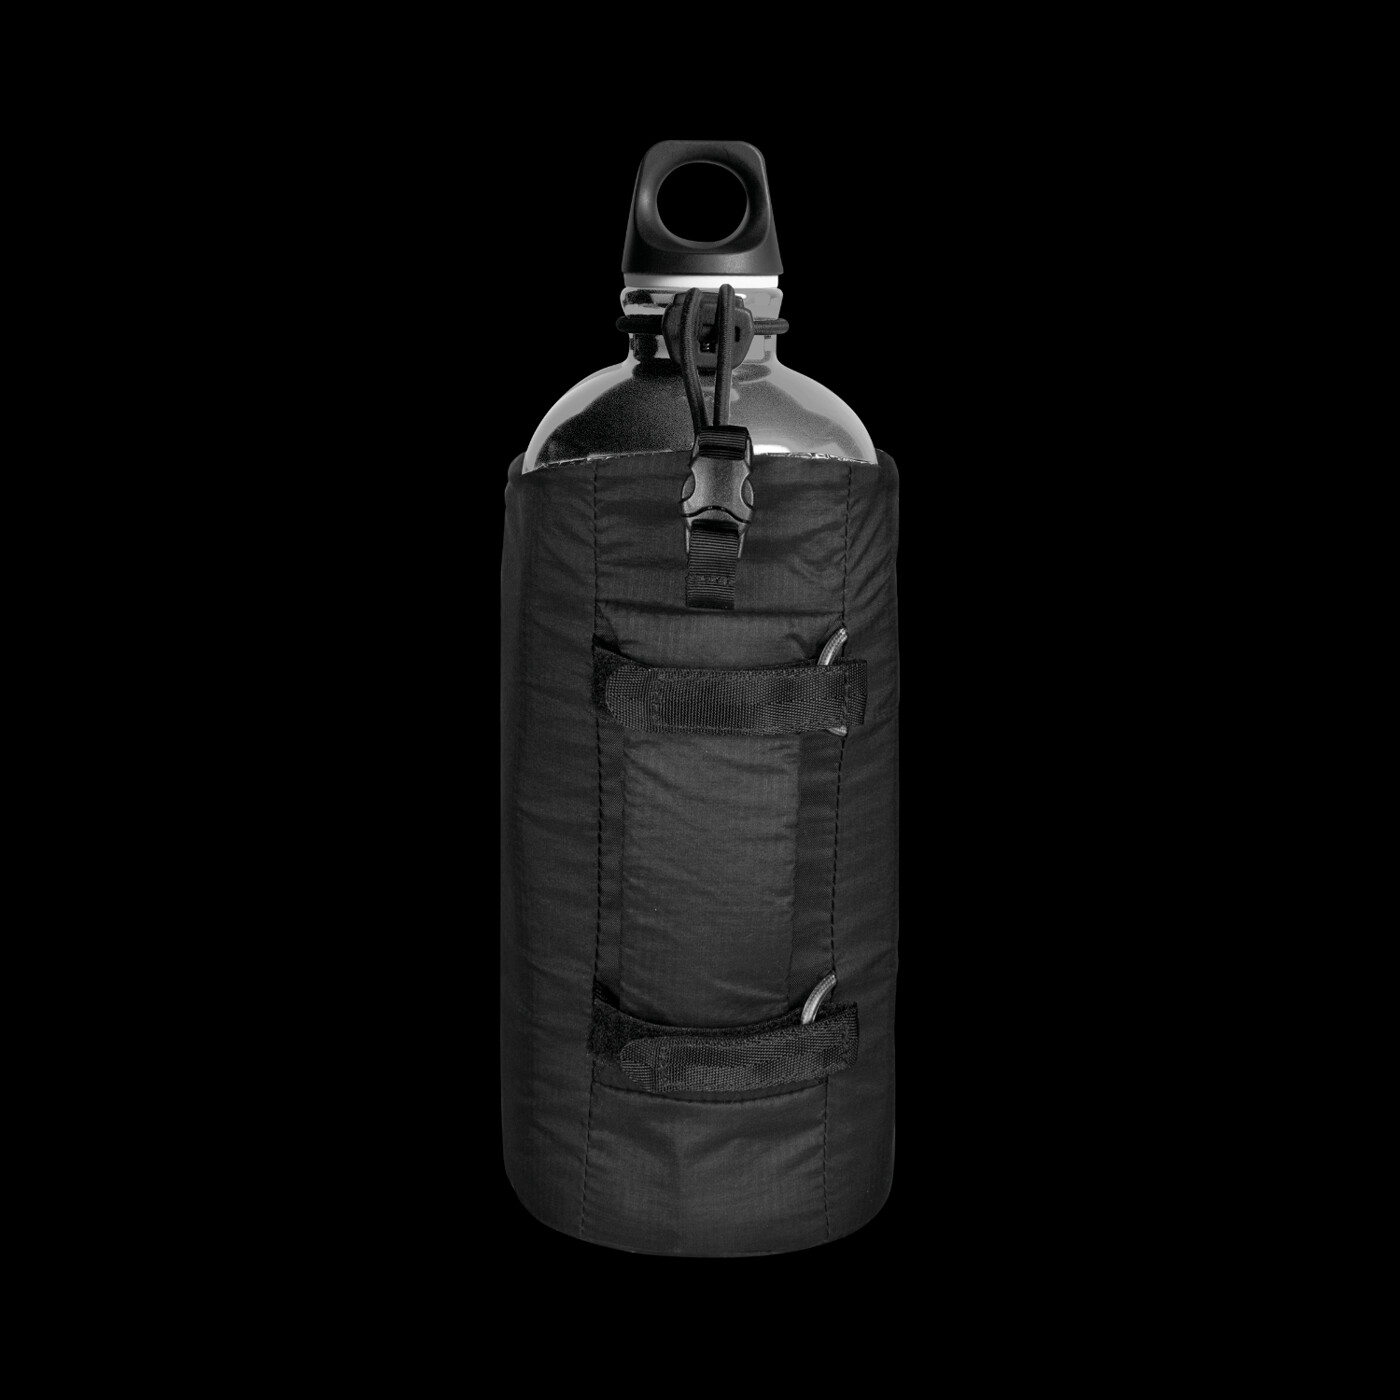 Add-on bottle holder insulated Mammut